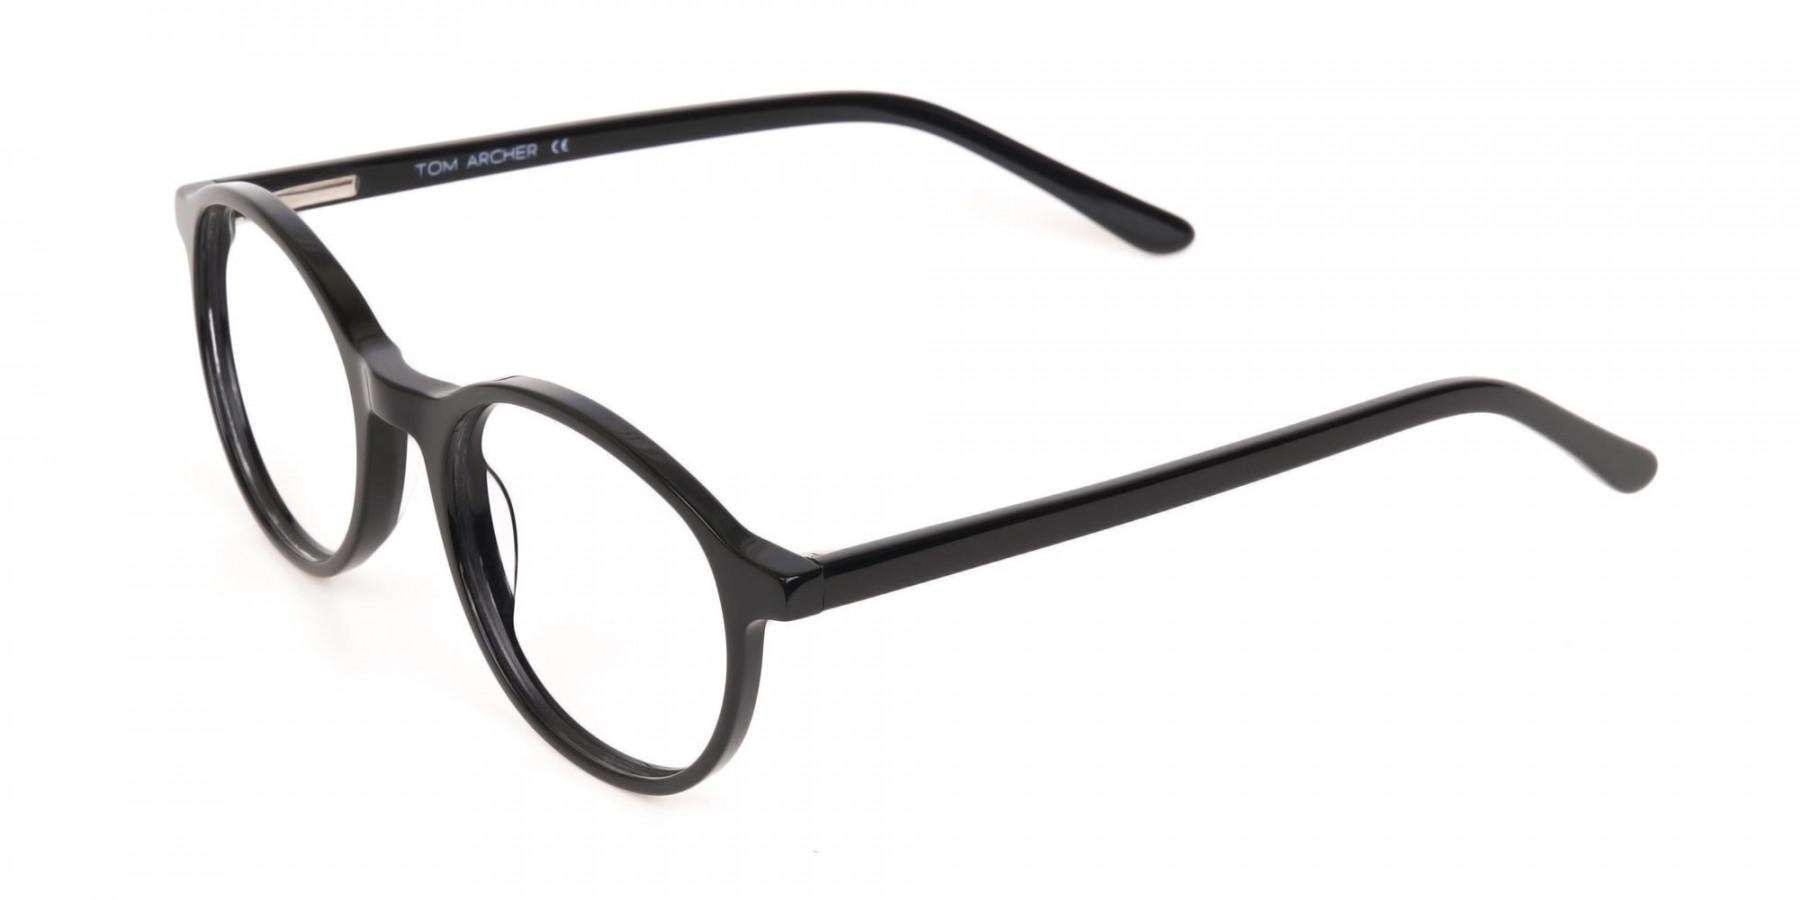 Black Acetate Round Eyeglasses For Unisex-1